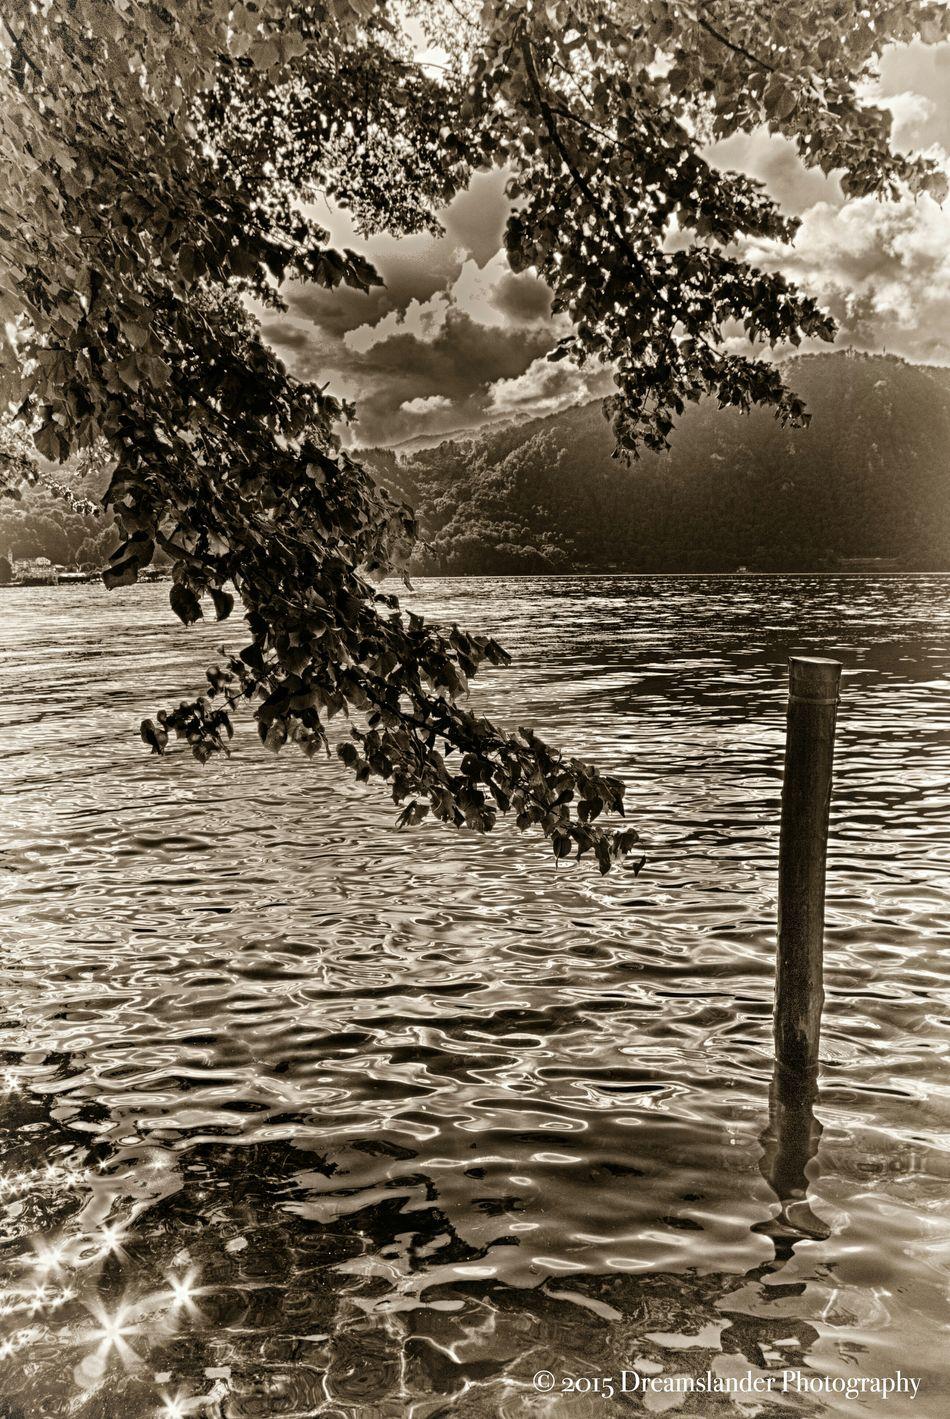 Monochromatic Blackandwhite Photography Black & White Monochrome Malinchonic Landscape Sea And Sky Lake View Light And Shadow